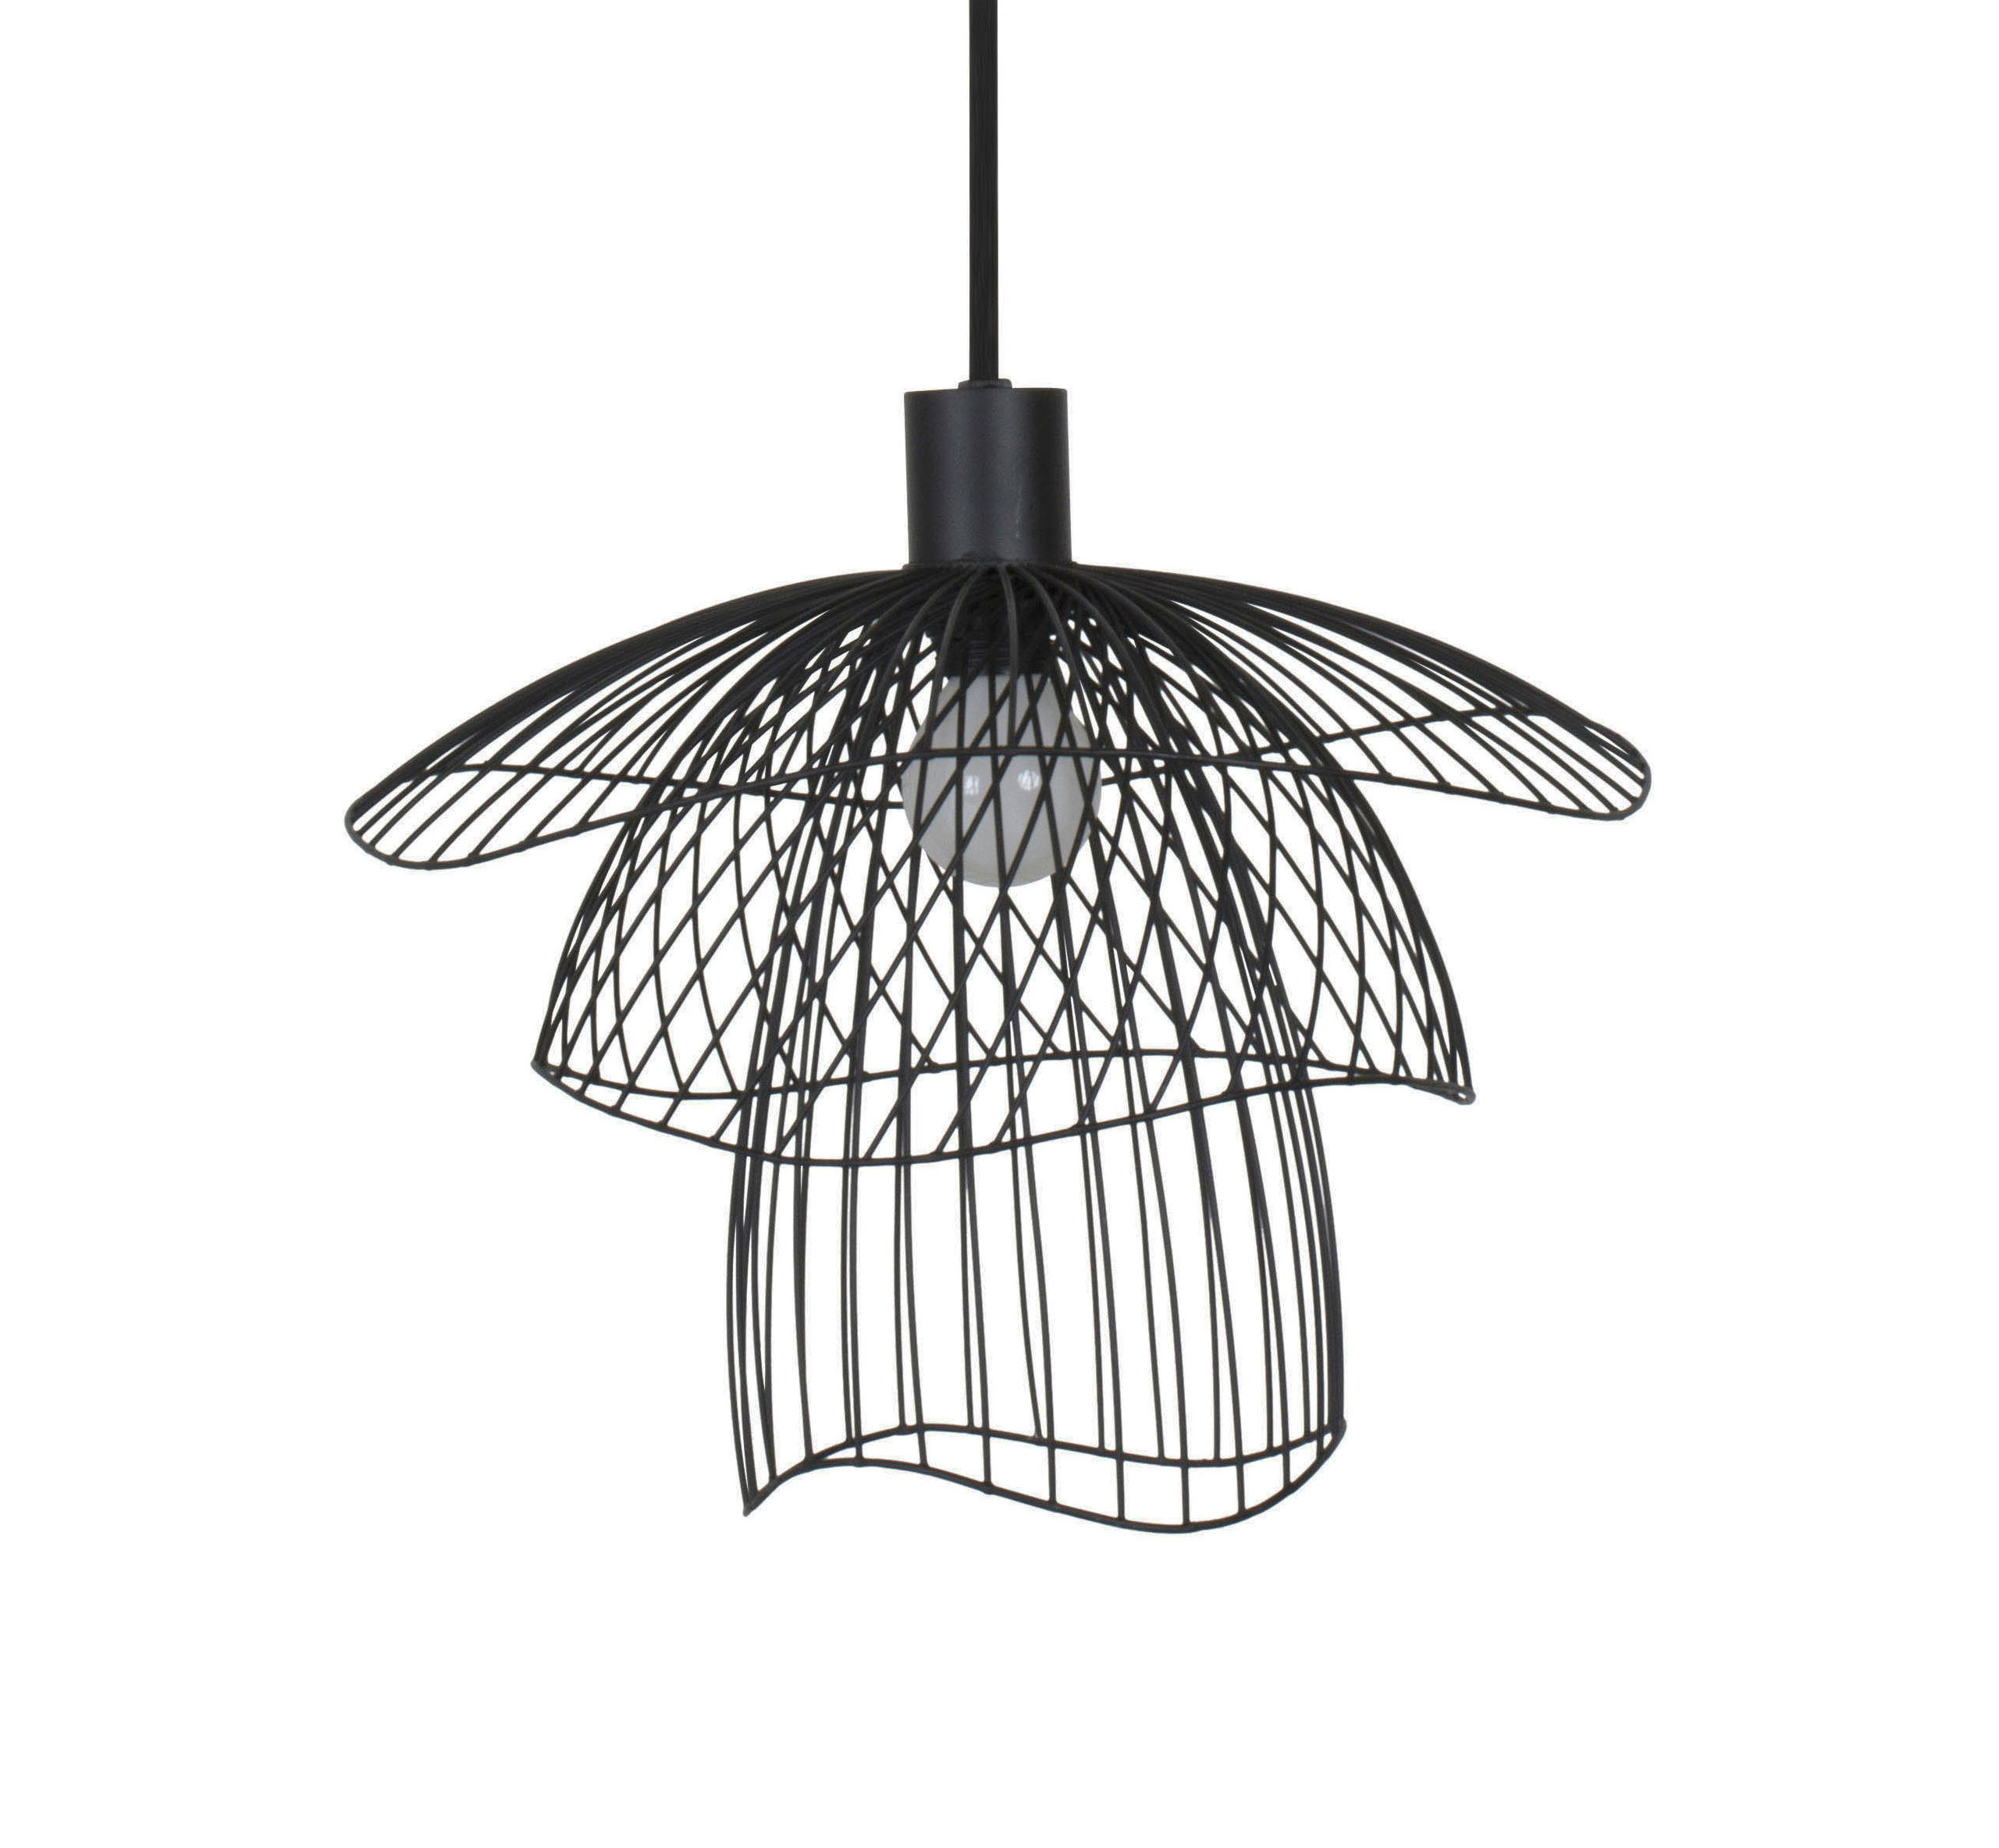 Lighting - Pendant Lighting - Papillon XS Pendant - / Ø 35 cm by Forestier - Black - Powder coated steel